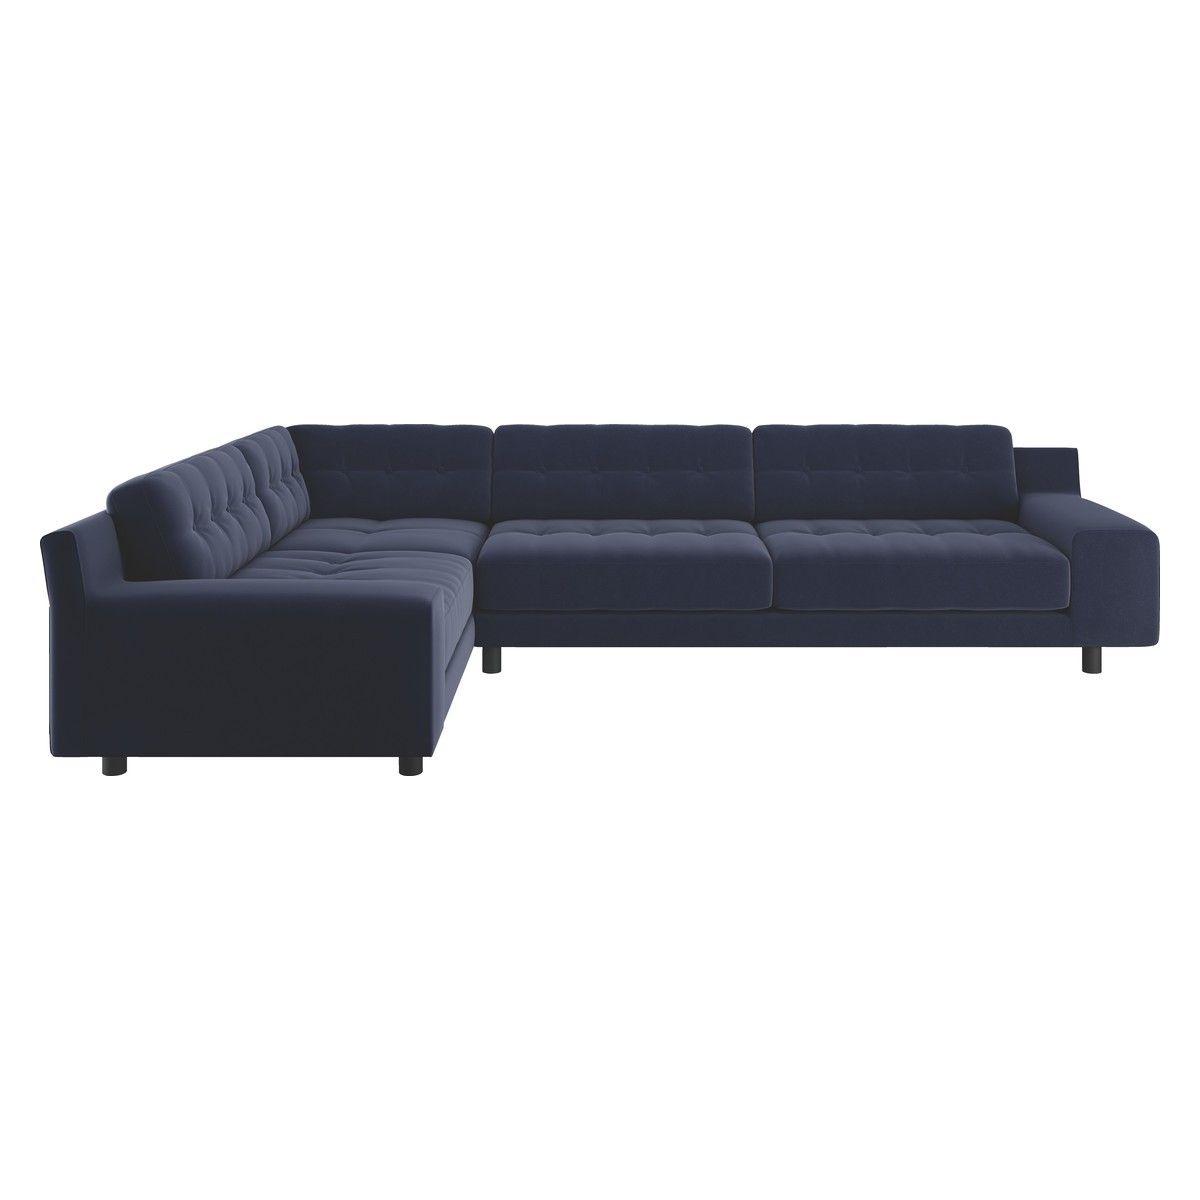 Hendricks Navy Velvet Right Arm Corner Sofa Corner Sofa Buy Sofa Sofa